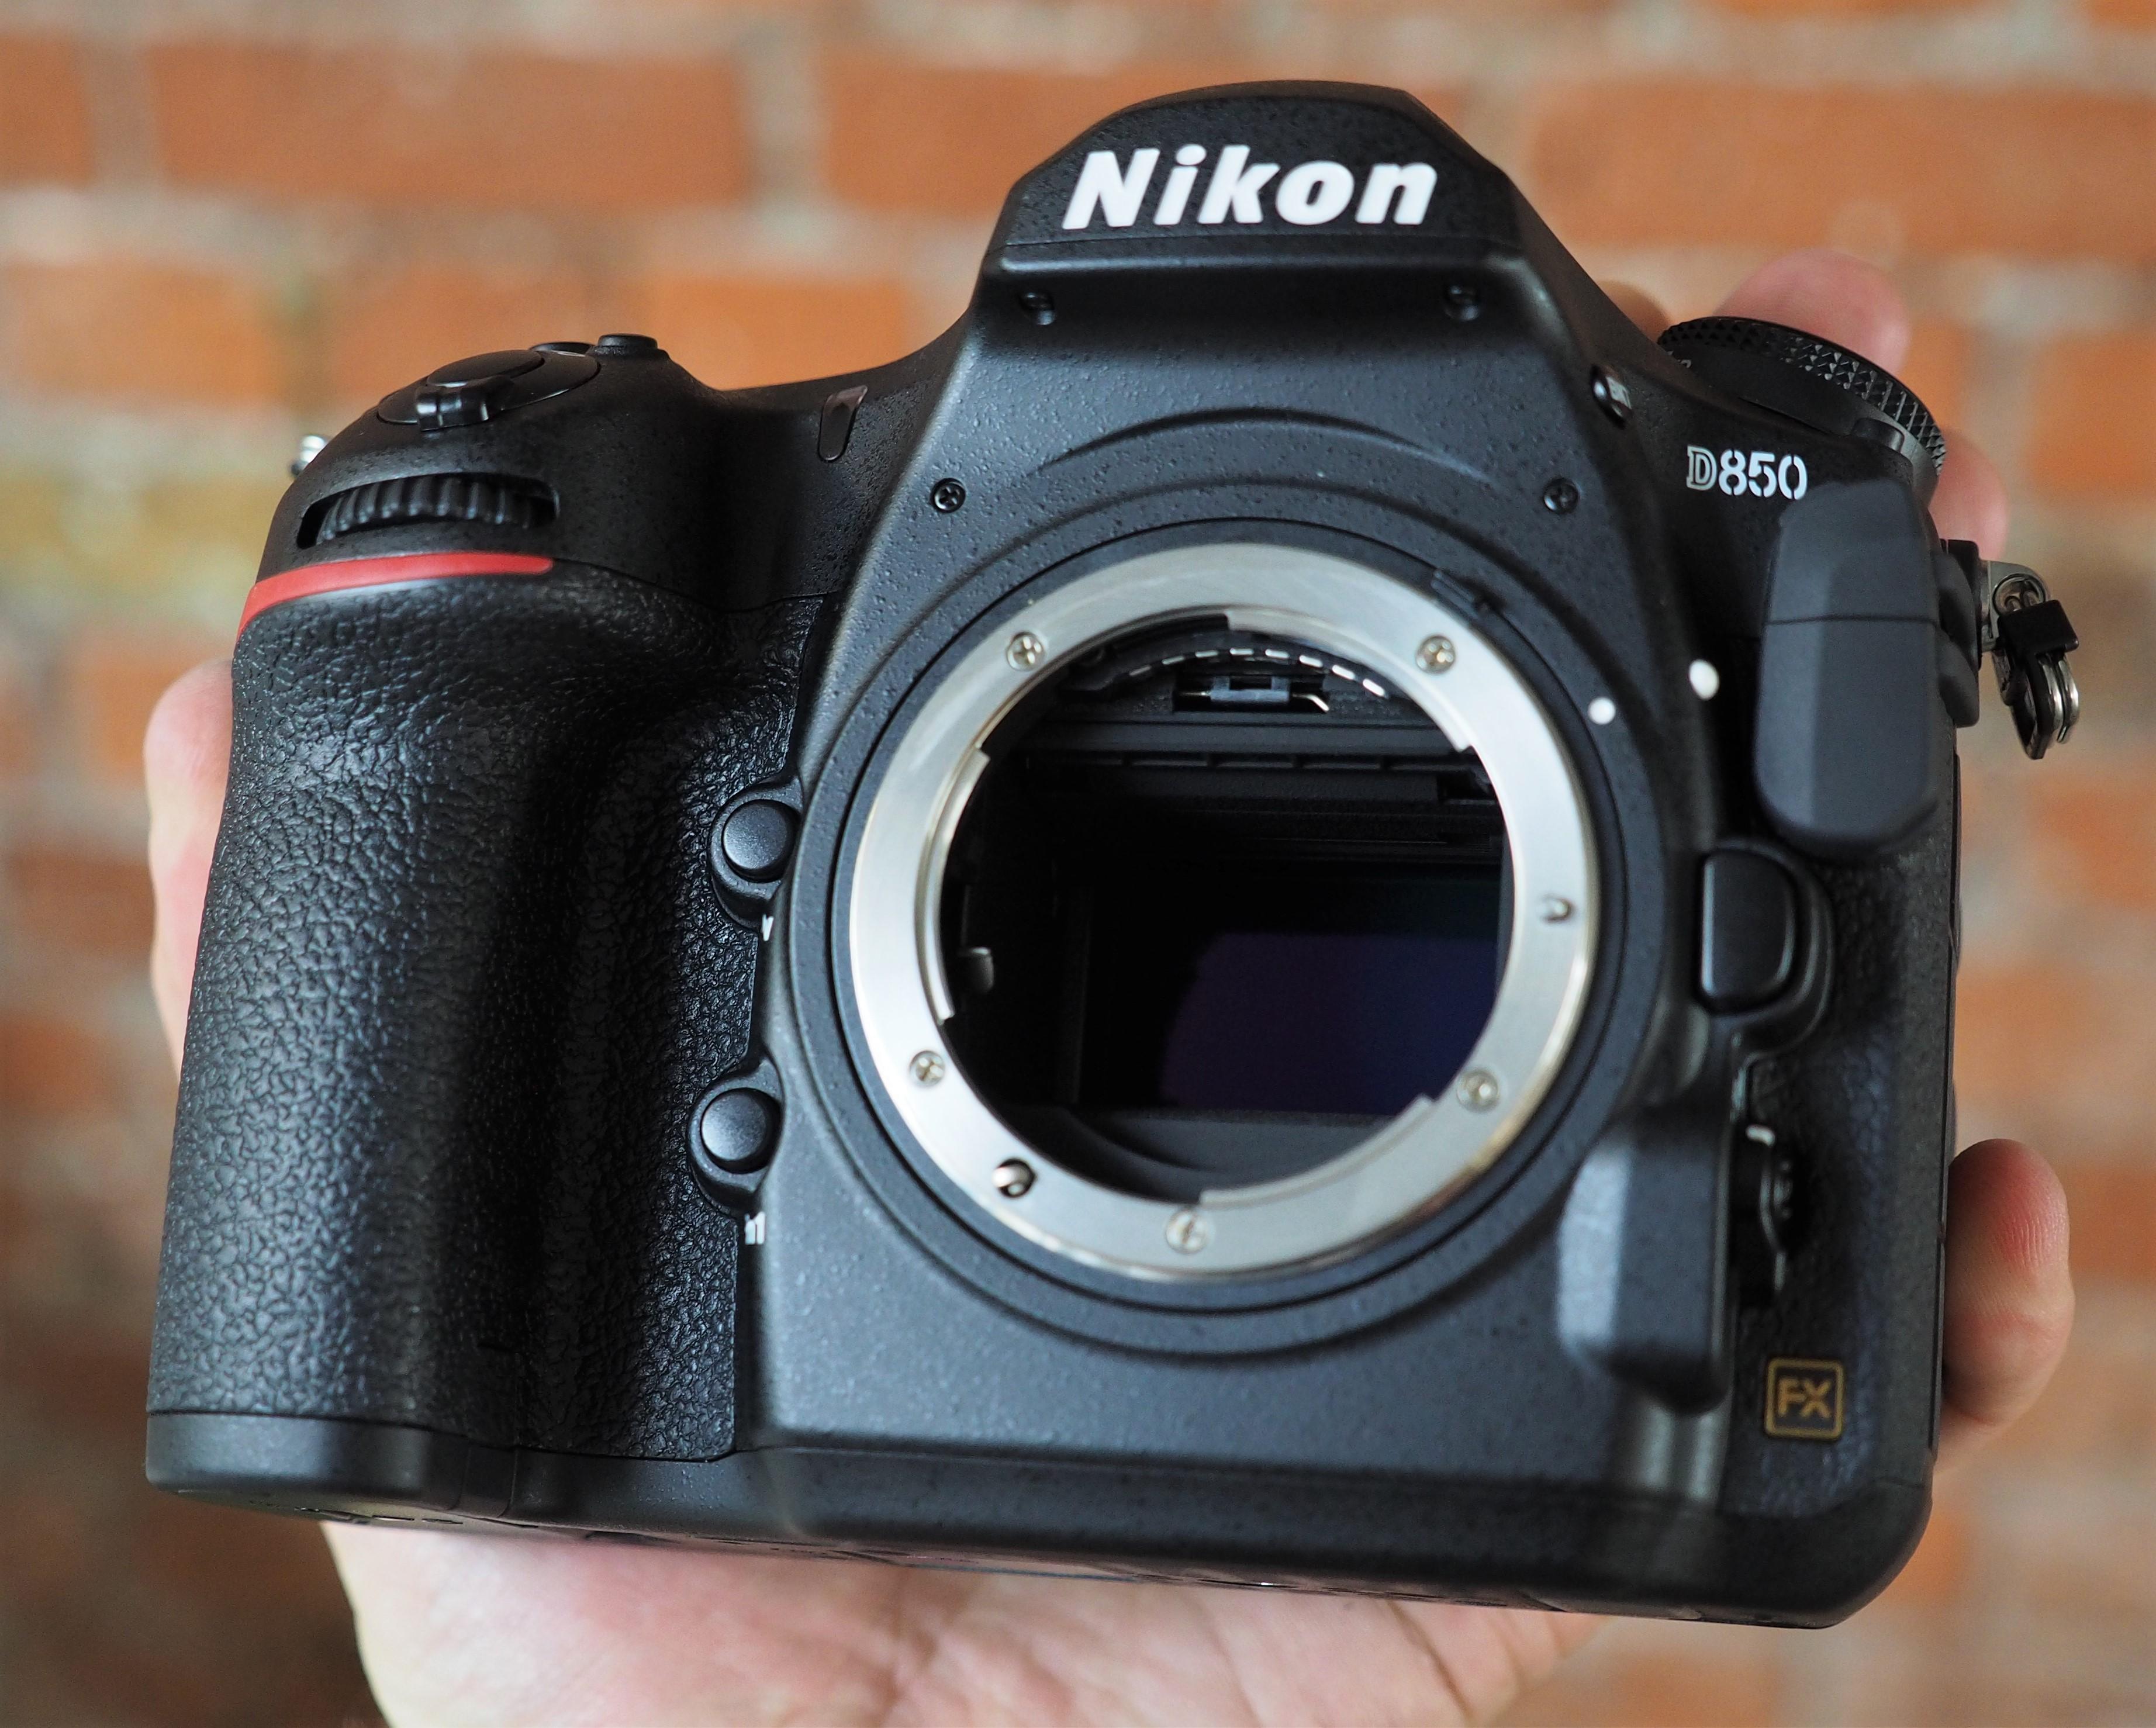 Nikon D850 Dslr Vs D810 Body Only High Res